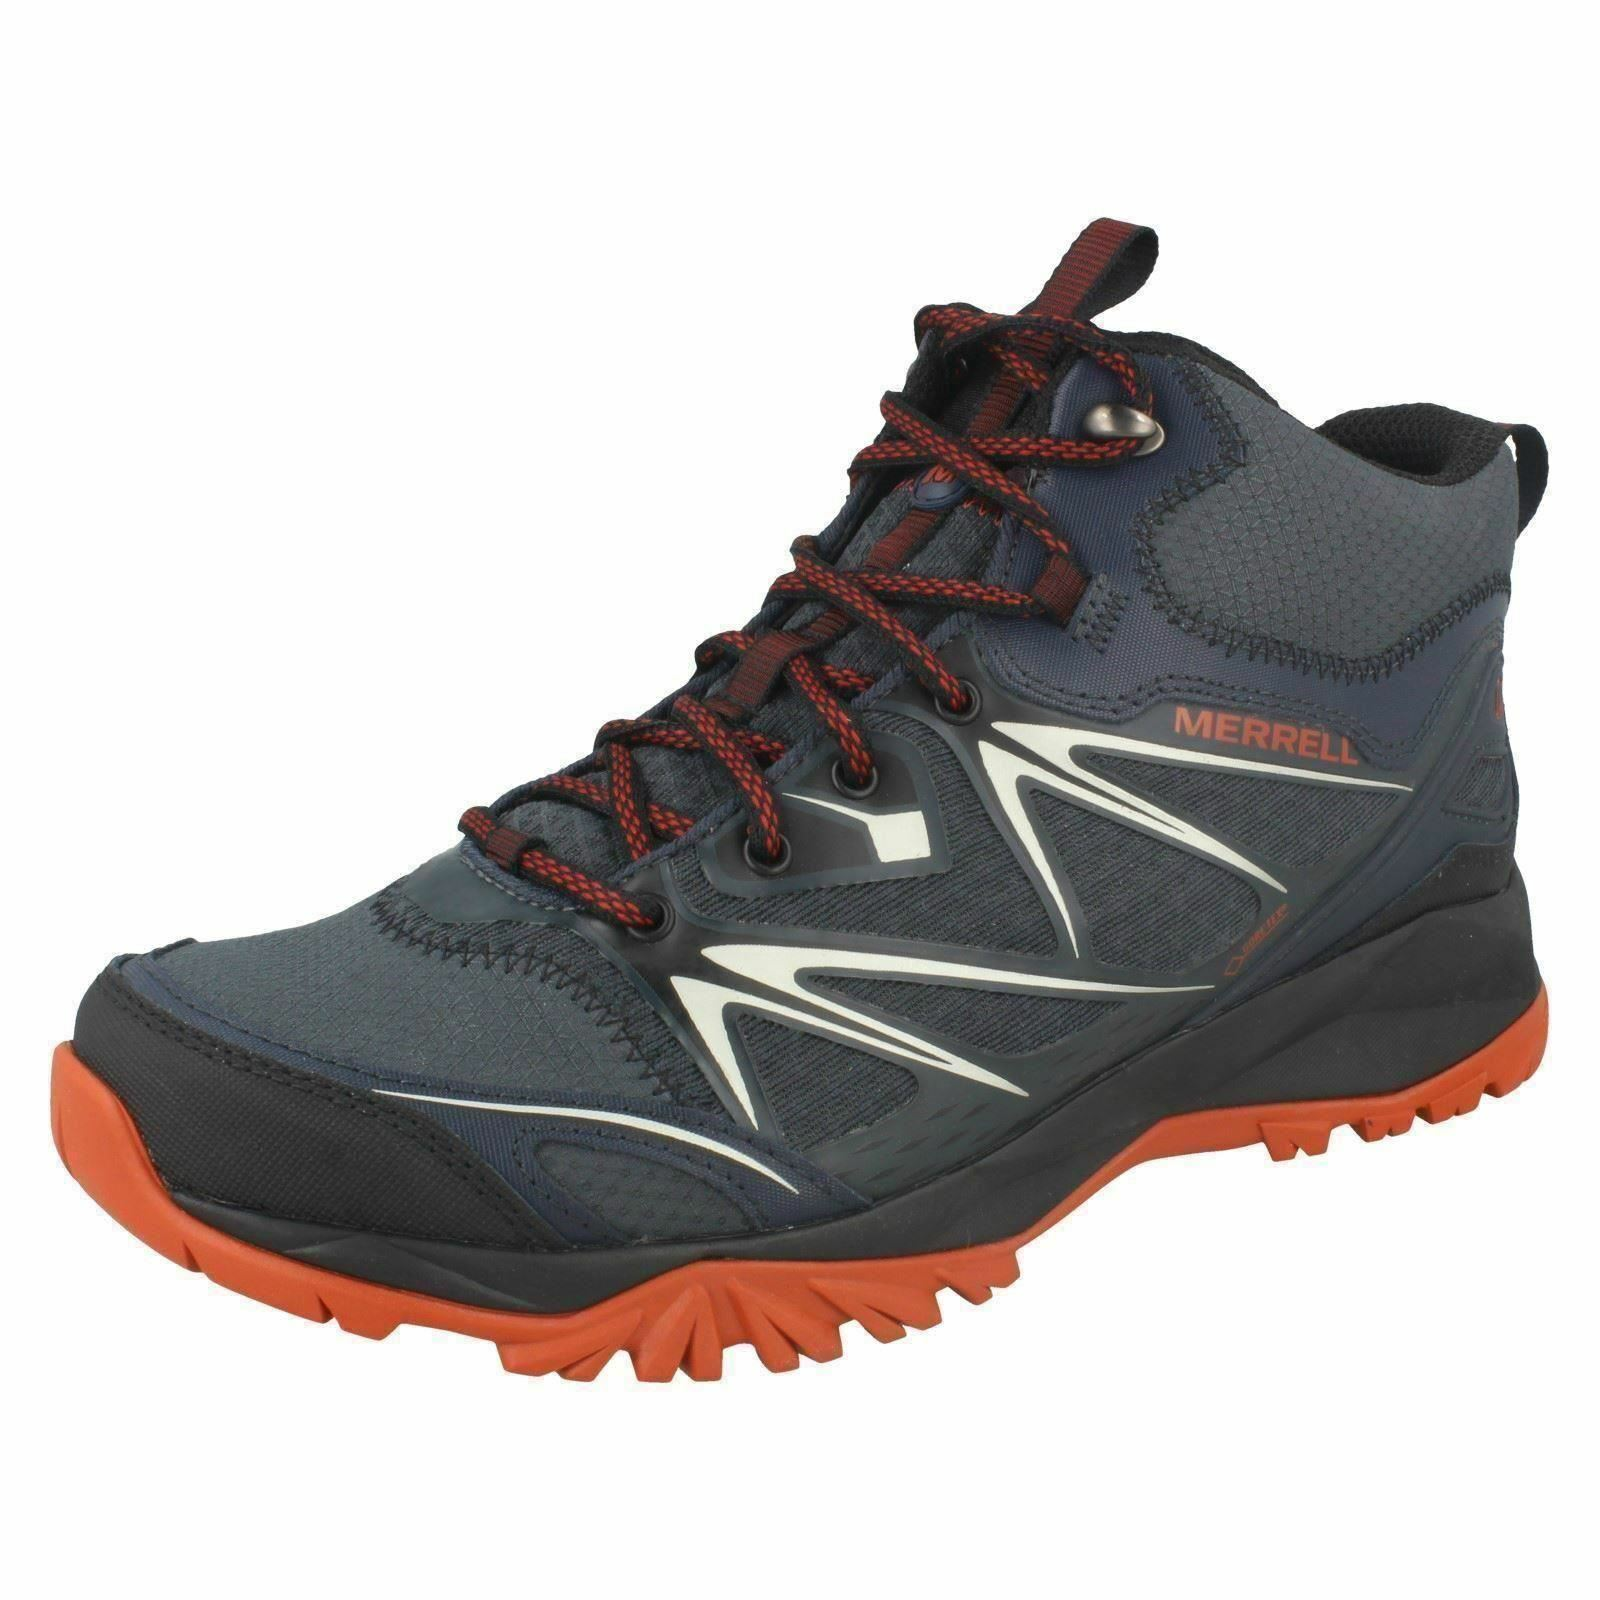 Mens Merrell Capra Bolt Mid Gore-Tex schwarz/Navy Lace Up Ankle Stiefel J35719